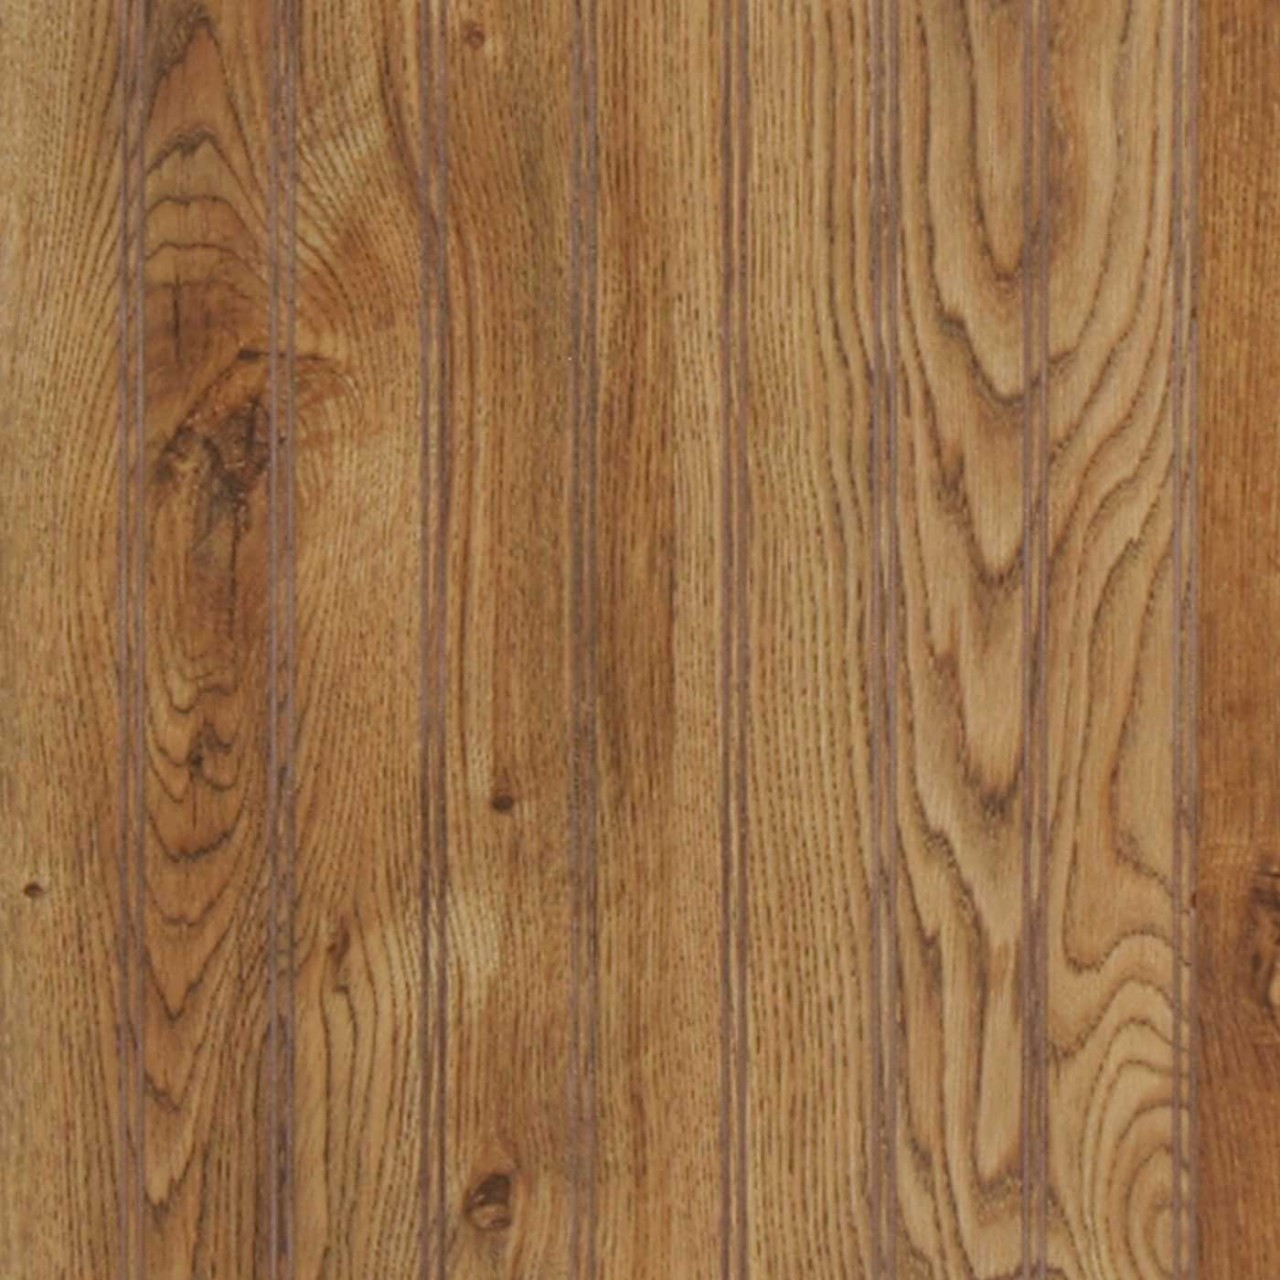 Wall Paneling Sheets : Paneling beadboard wall inch beaded gala oak